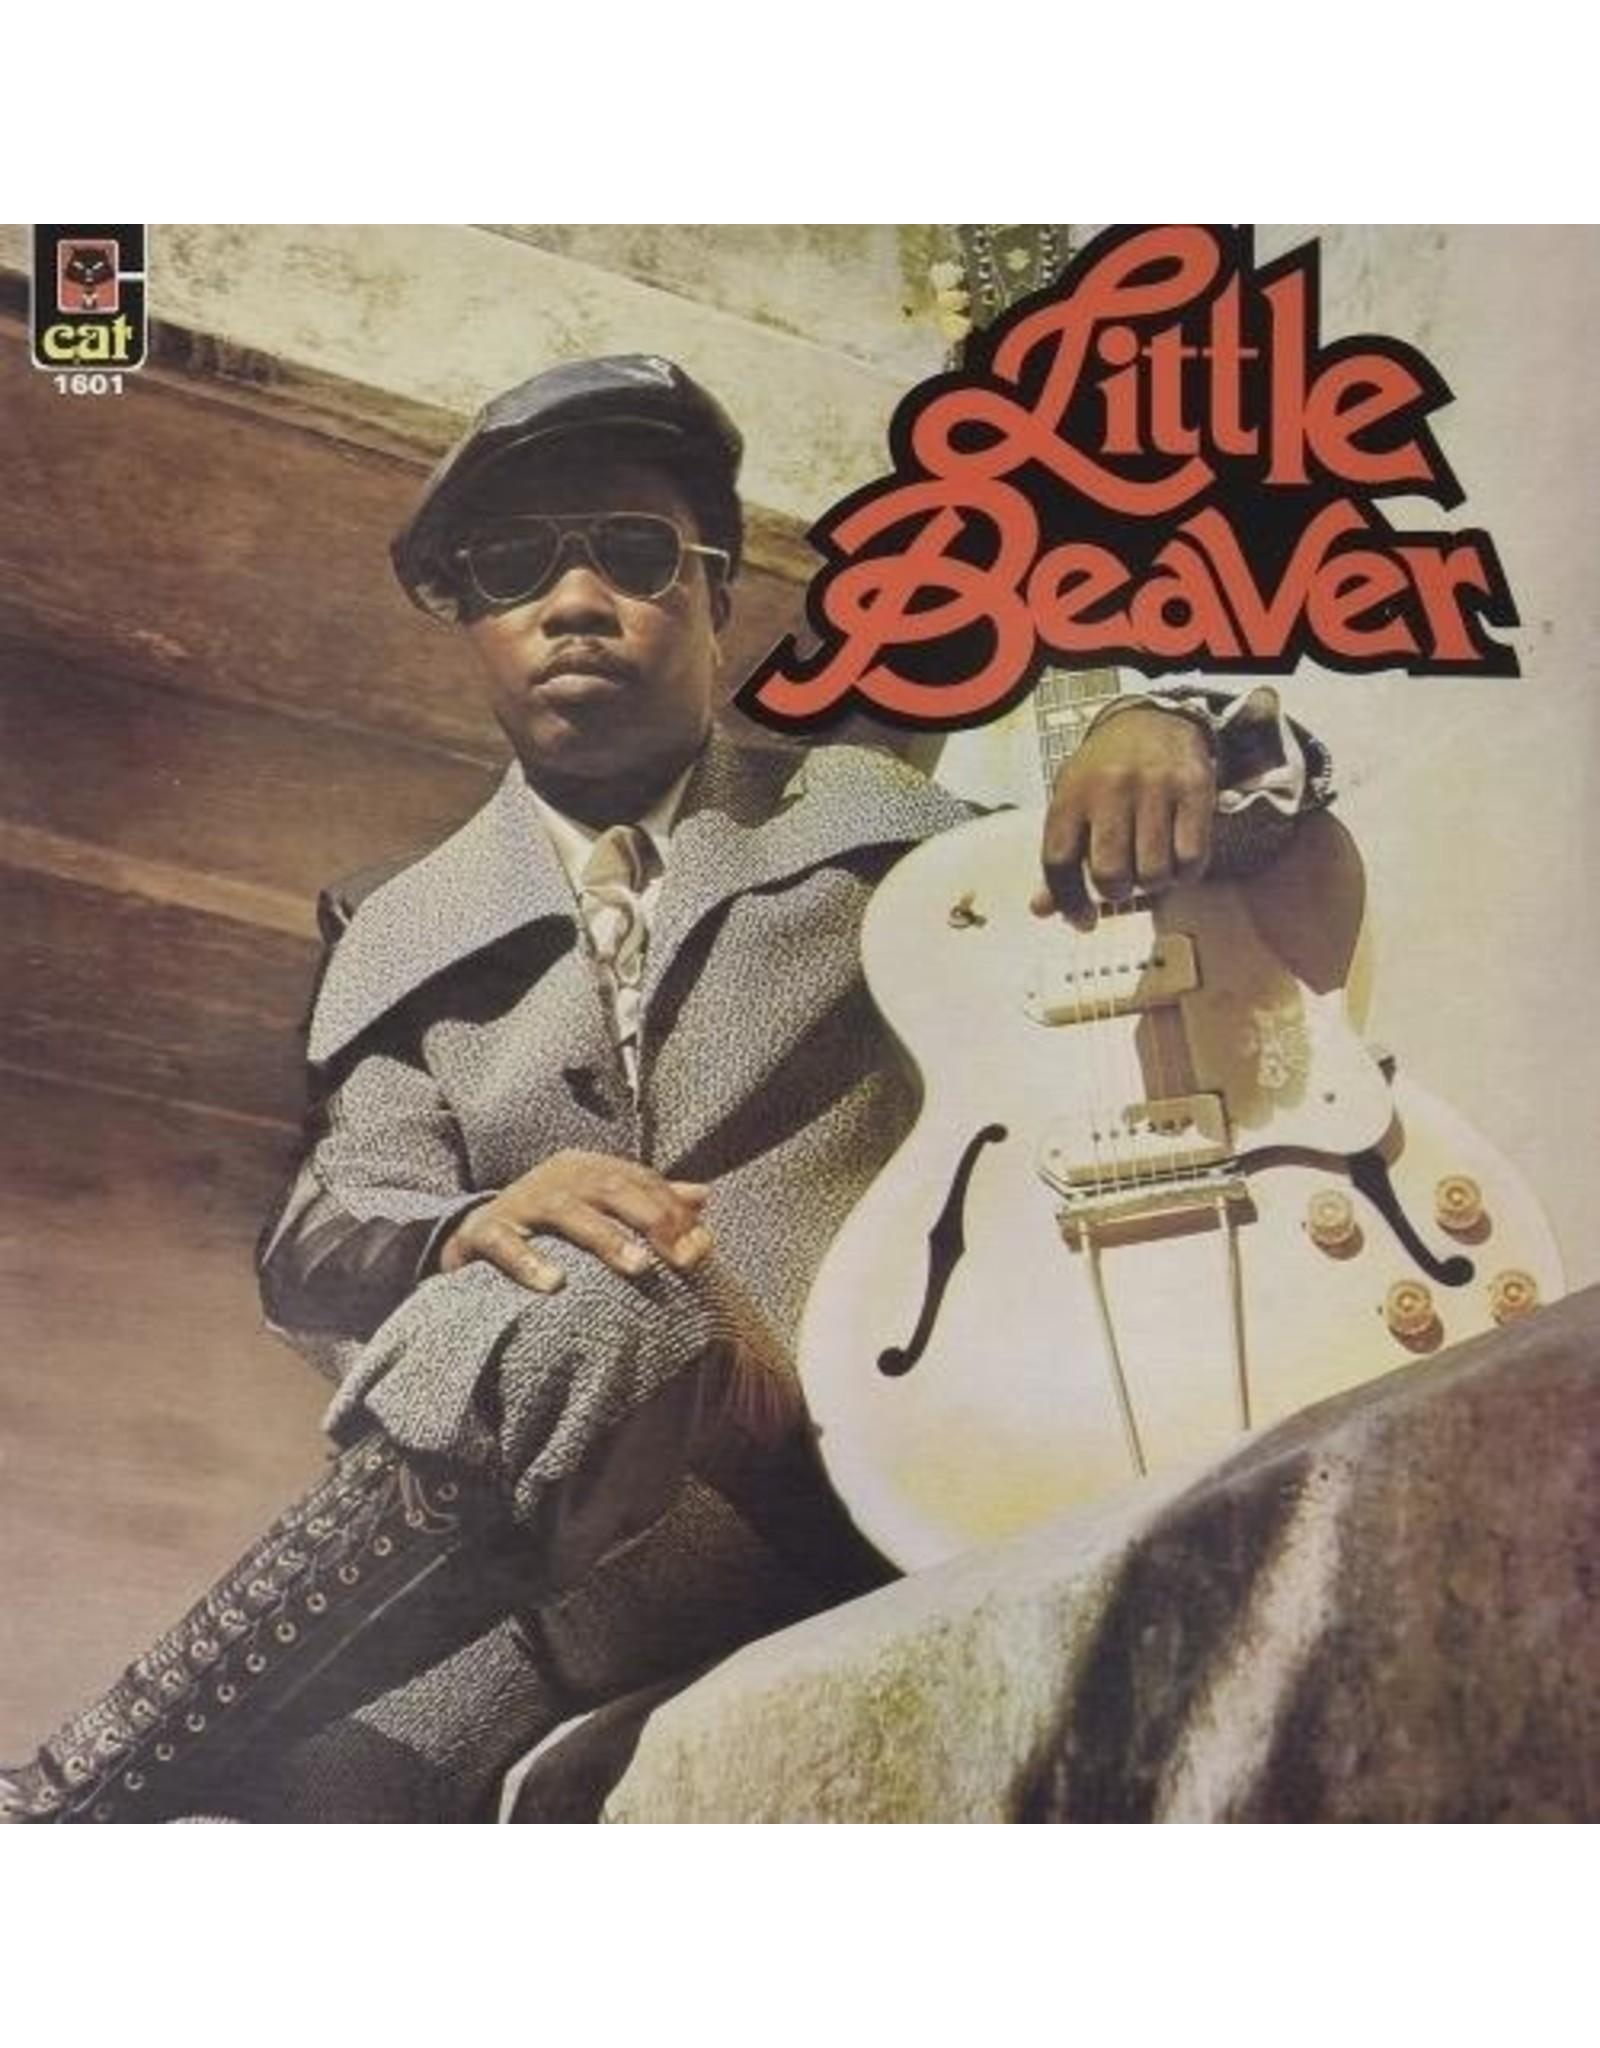 New Vinyl Little Beaver - Joey LP